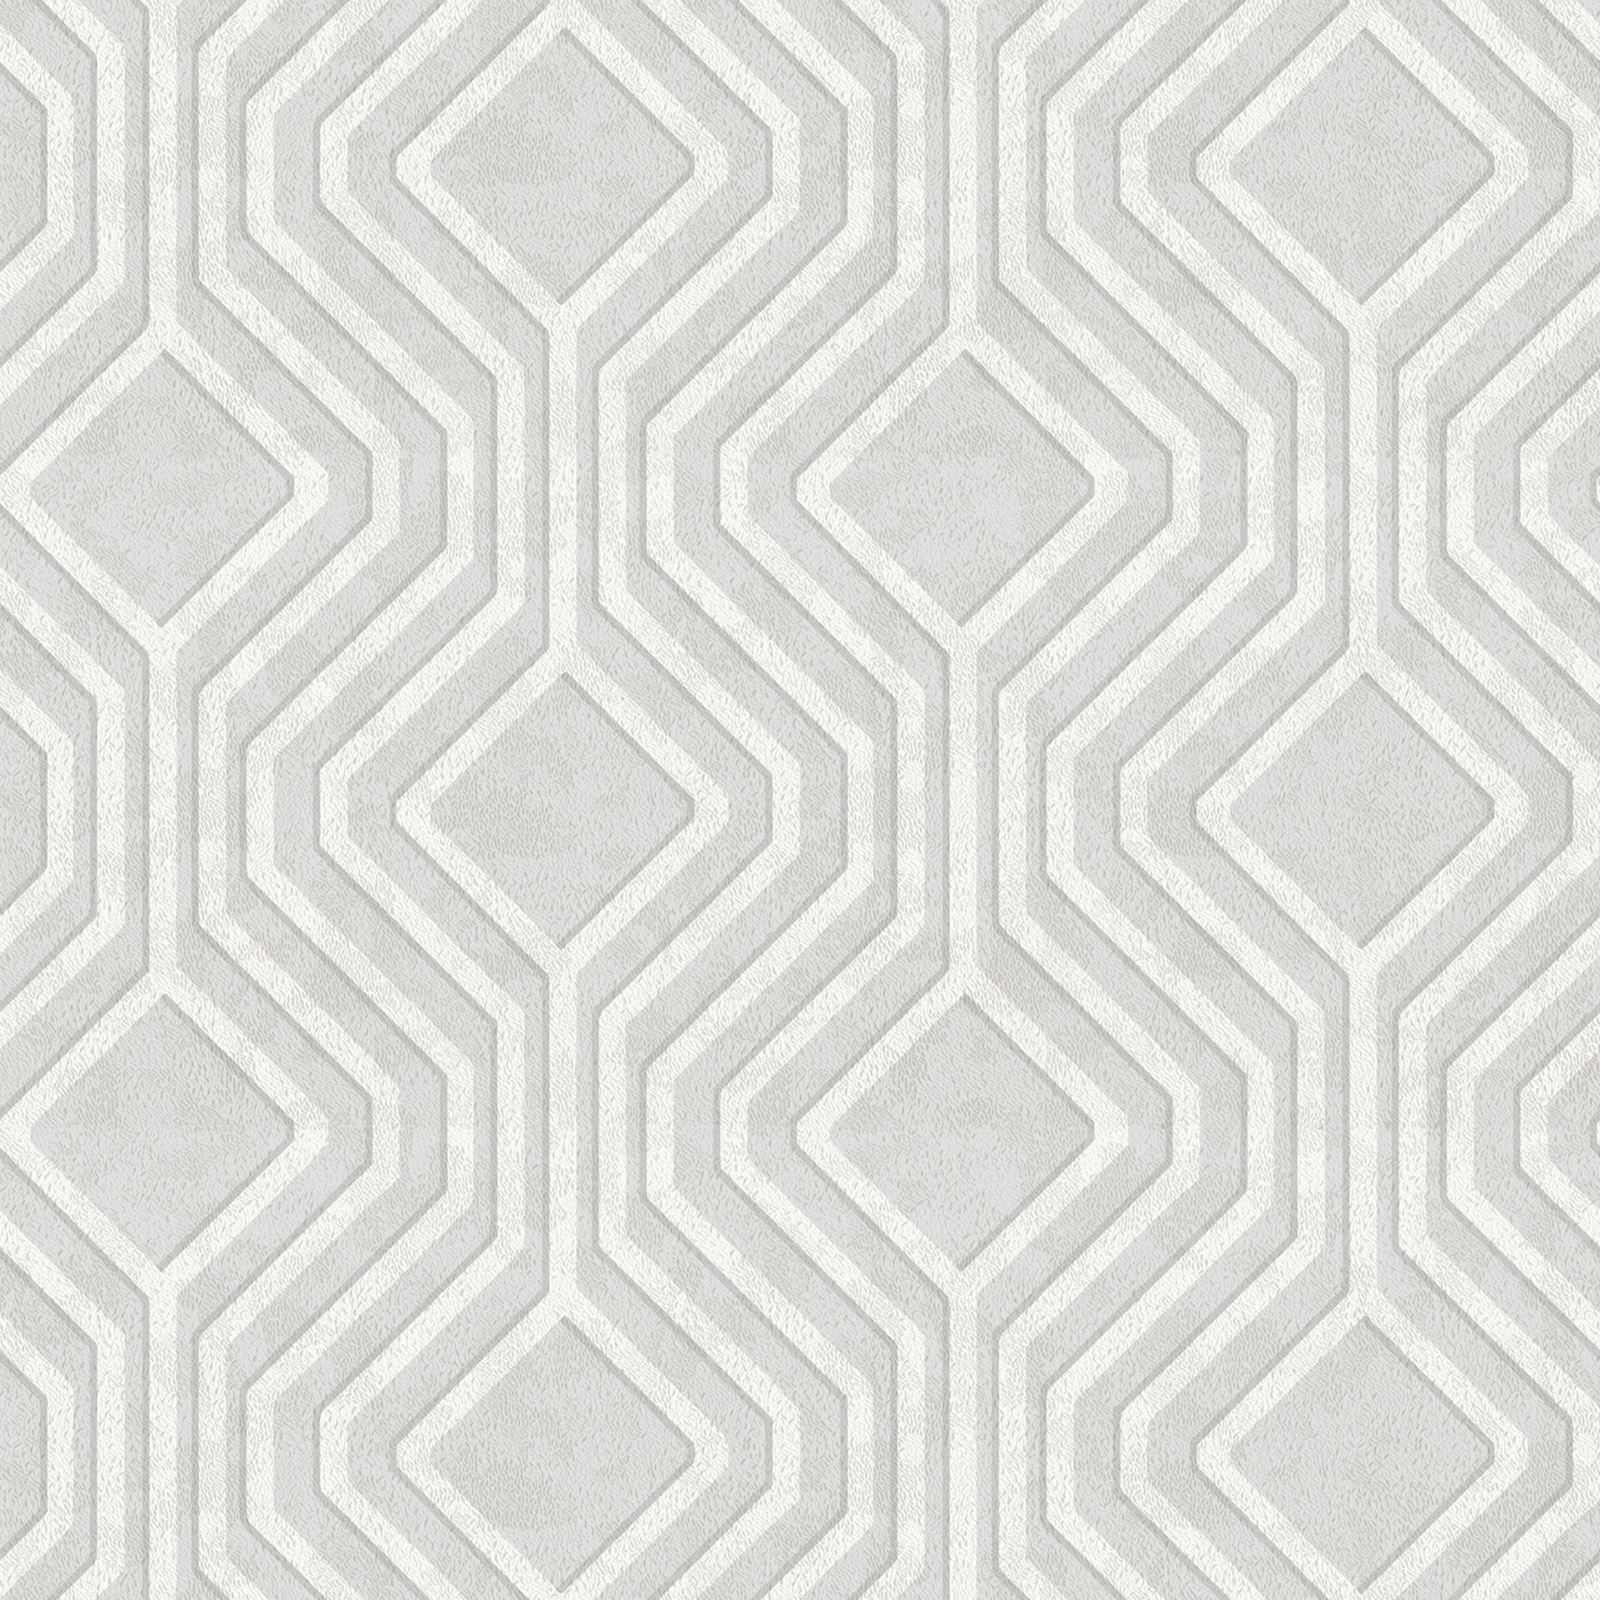 Grey Silver Wallpaper Patterned